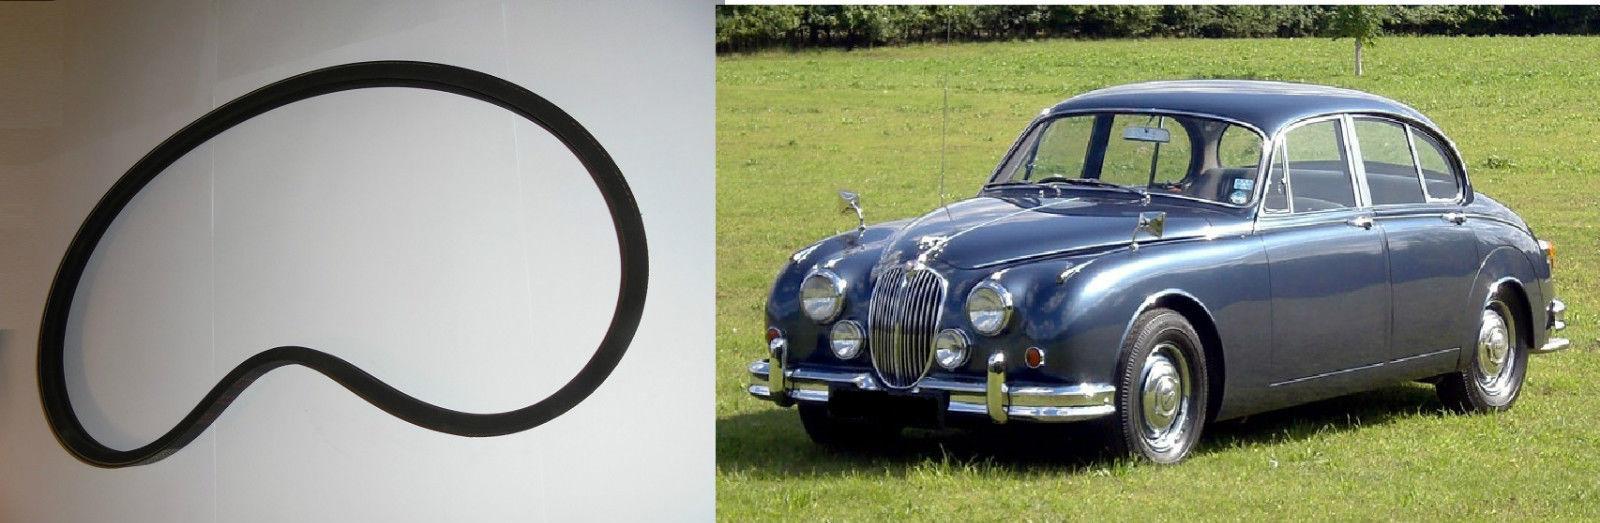 FAN BELT (Jaguar Mk2, 240 )   (2.4 Only)   (**Not 3.4 or 3.8 **)  (1959- Eng. BH5364)